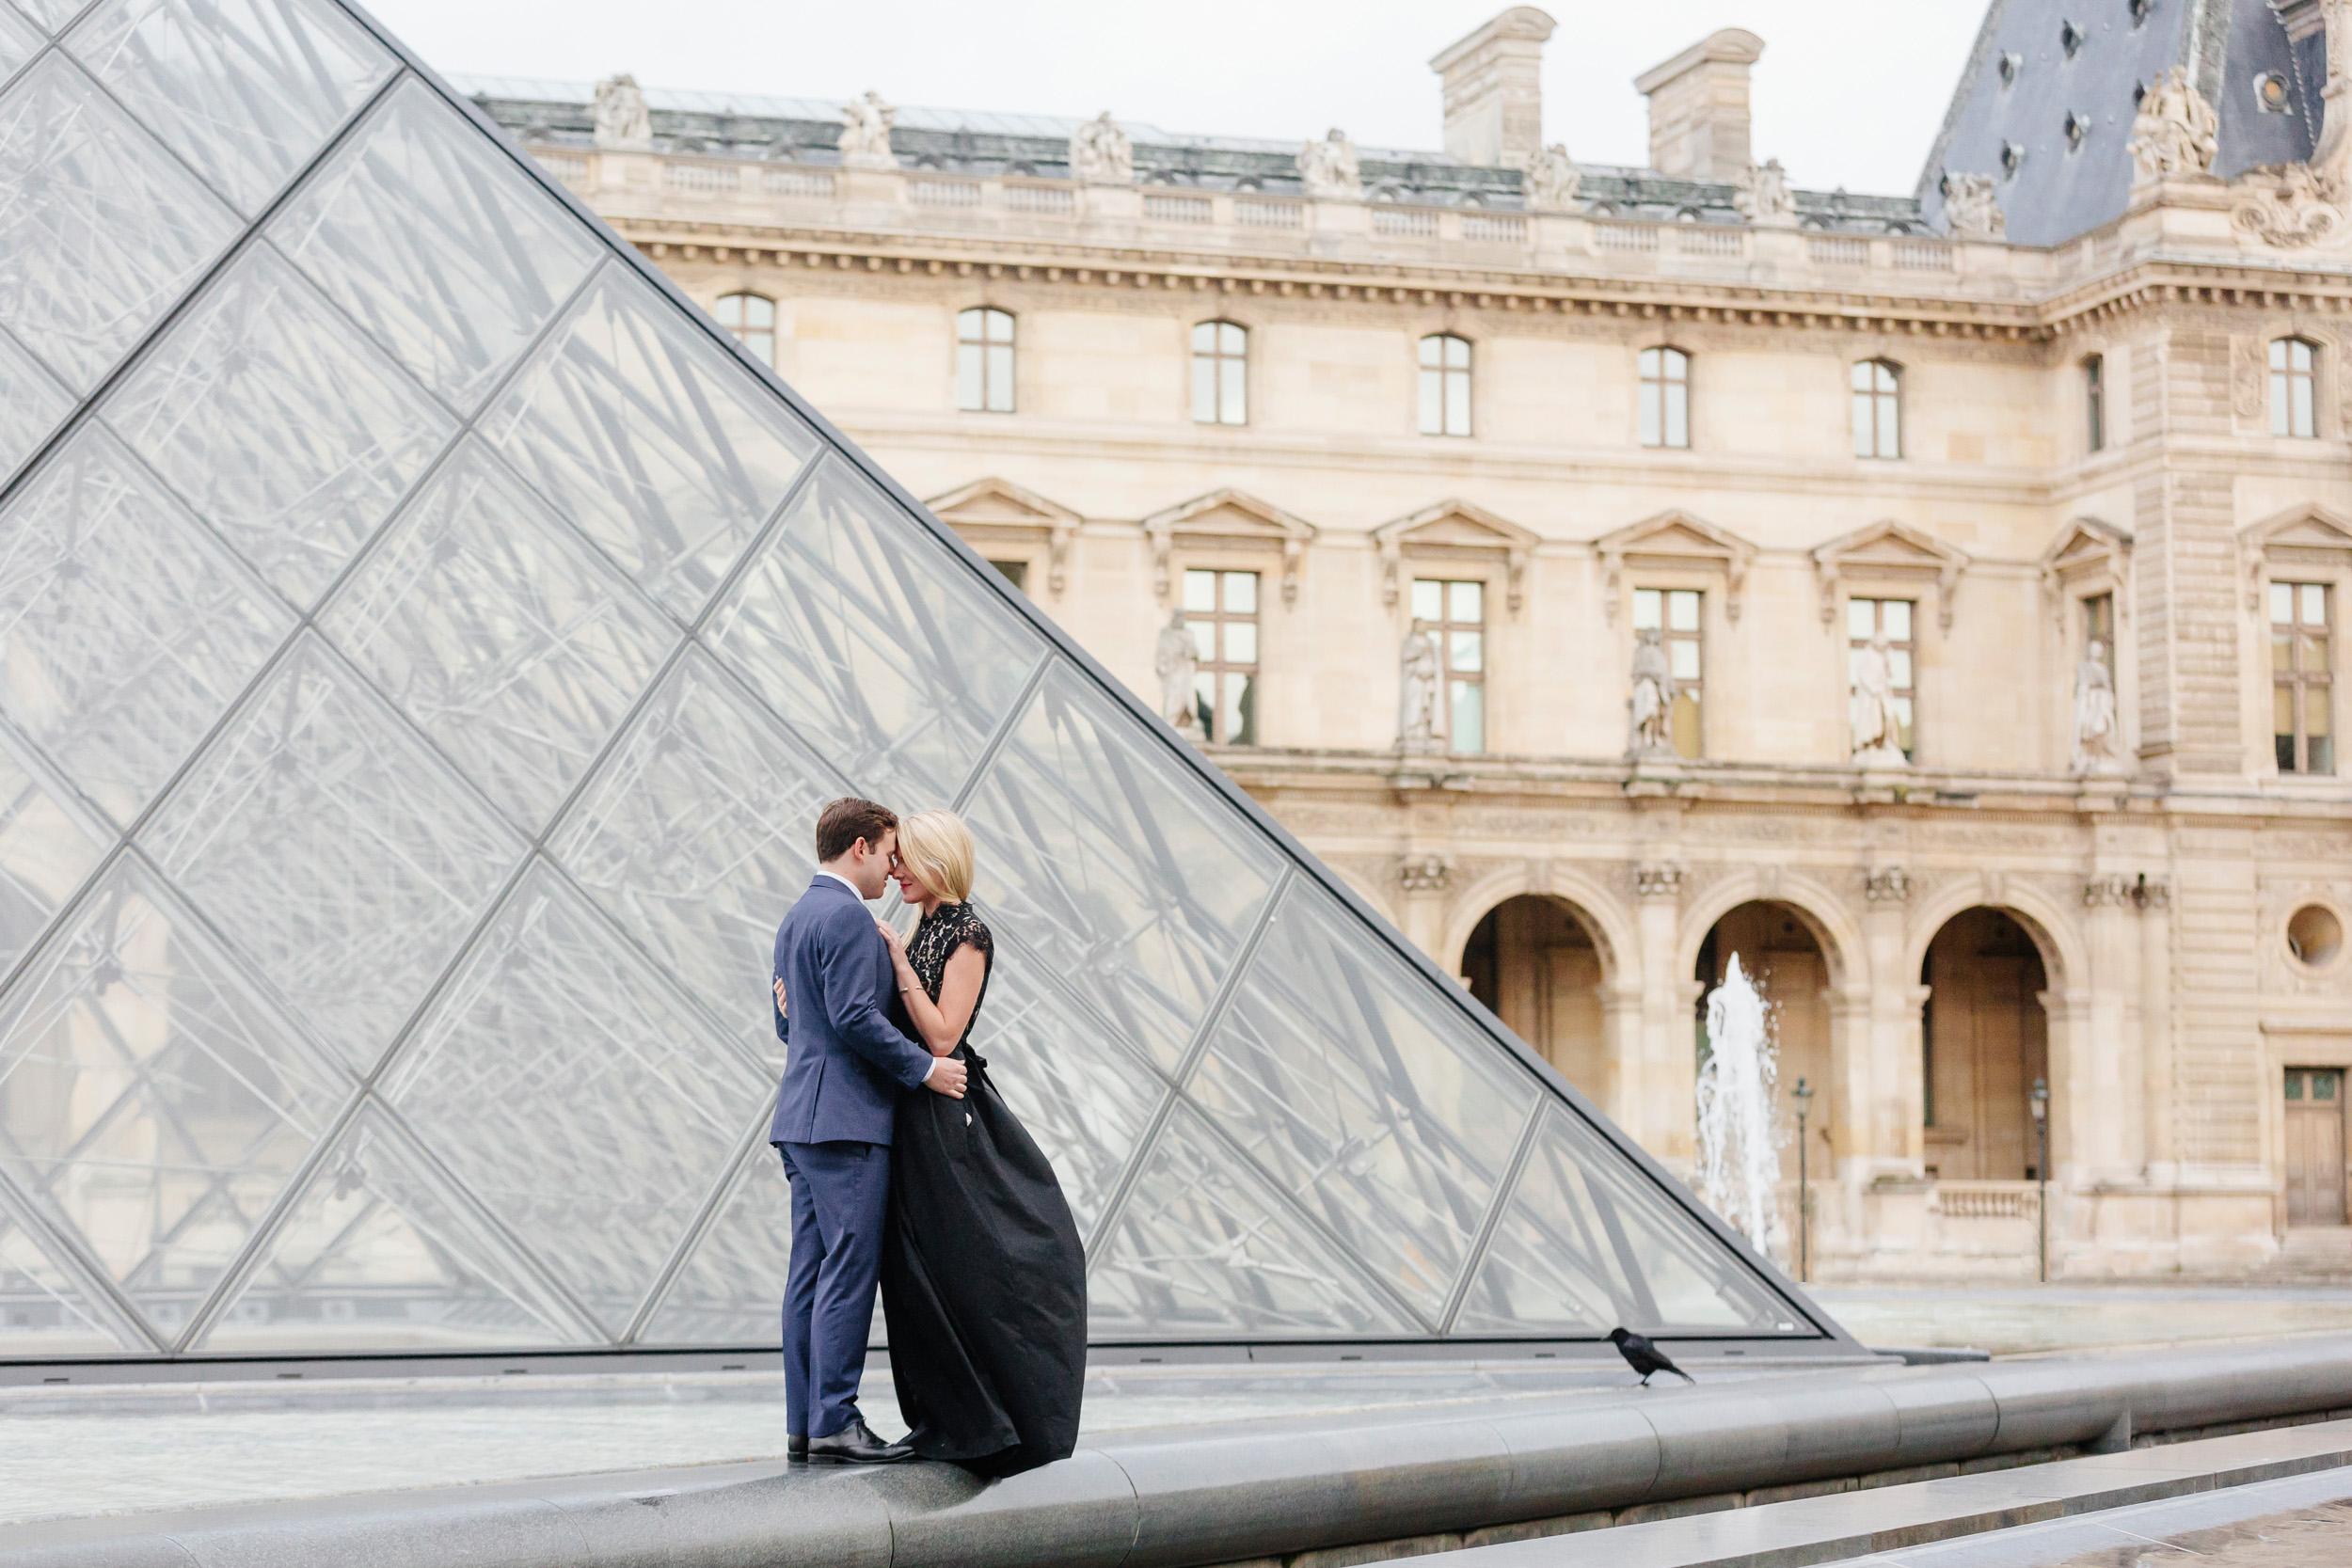 Paris vacation couple portrait hugging by Louvre Museum Pyramid captured by Paris Photographer Federico Guendel www.iheartparis.fr